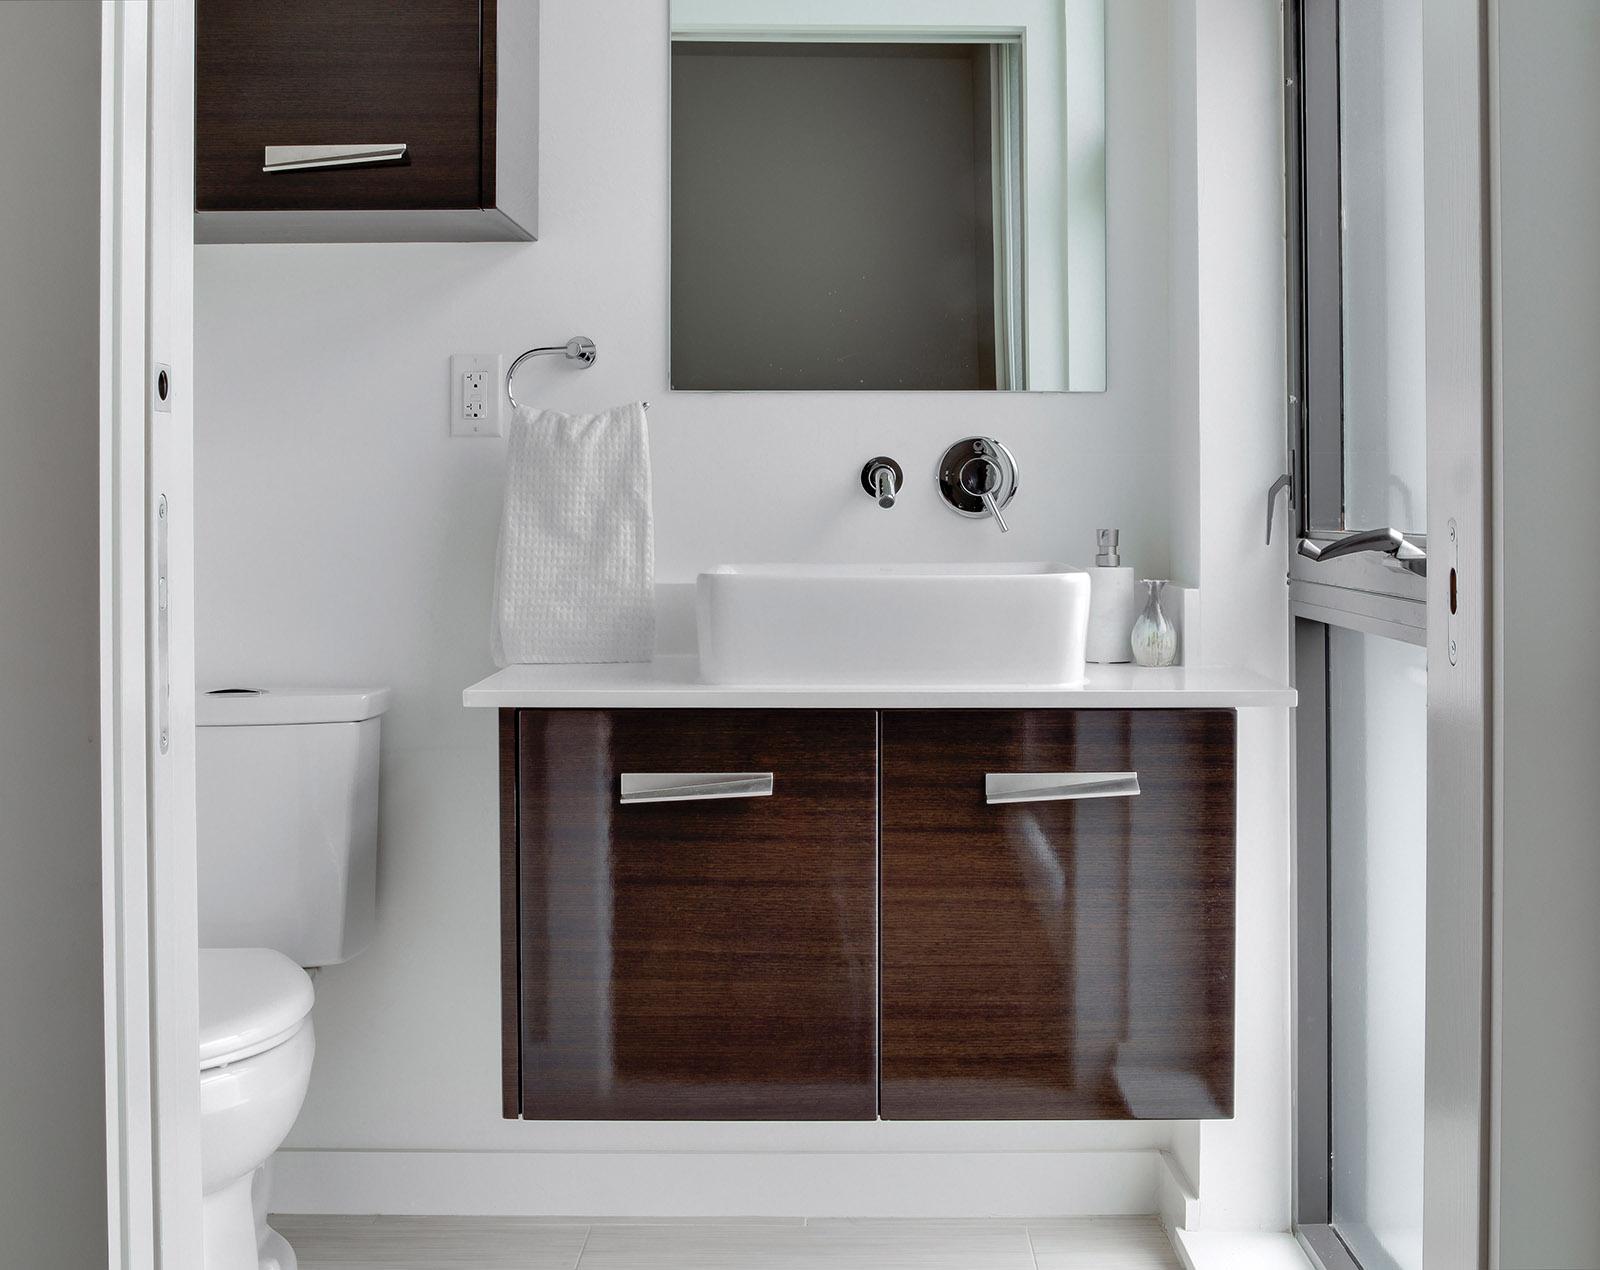 LOFT BATHROOM: Dark Wood Cabinetry